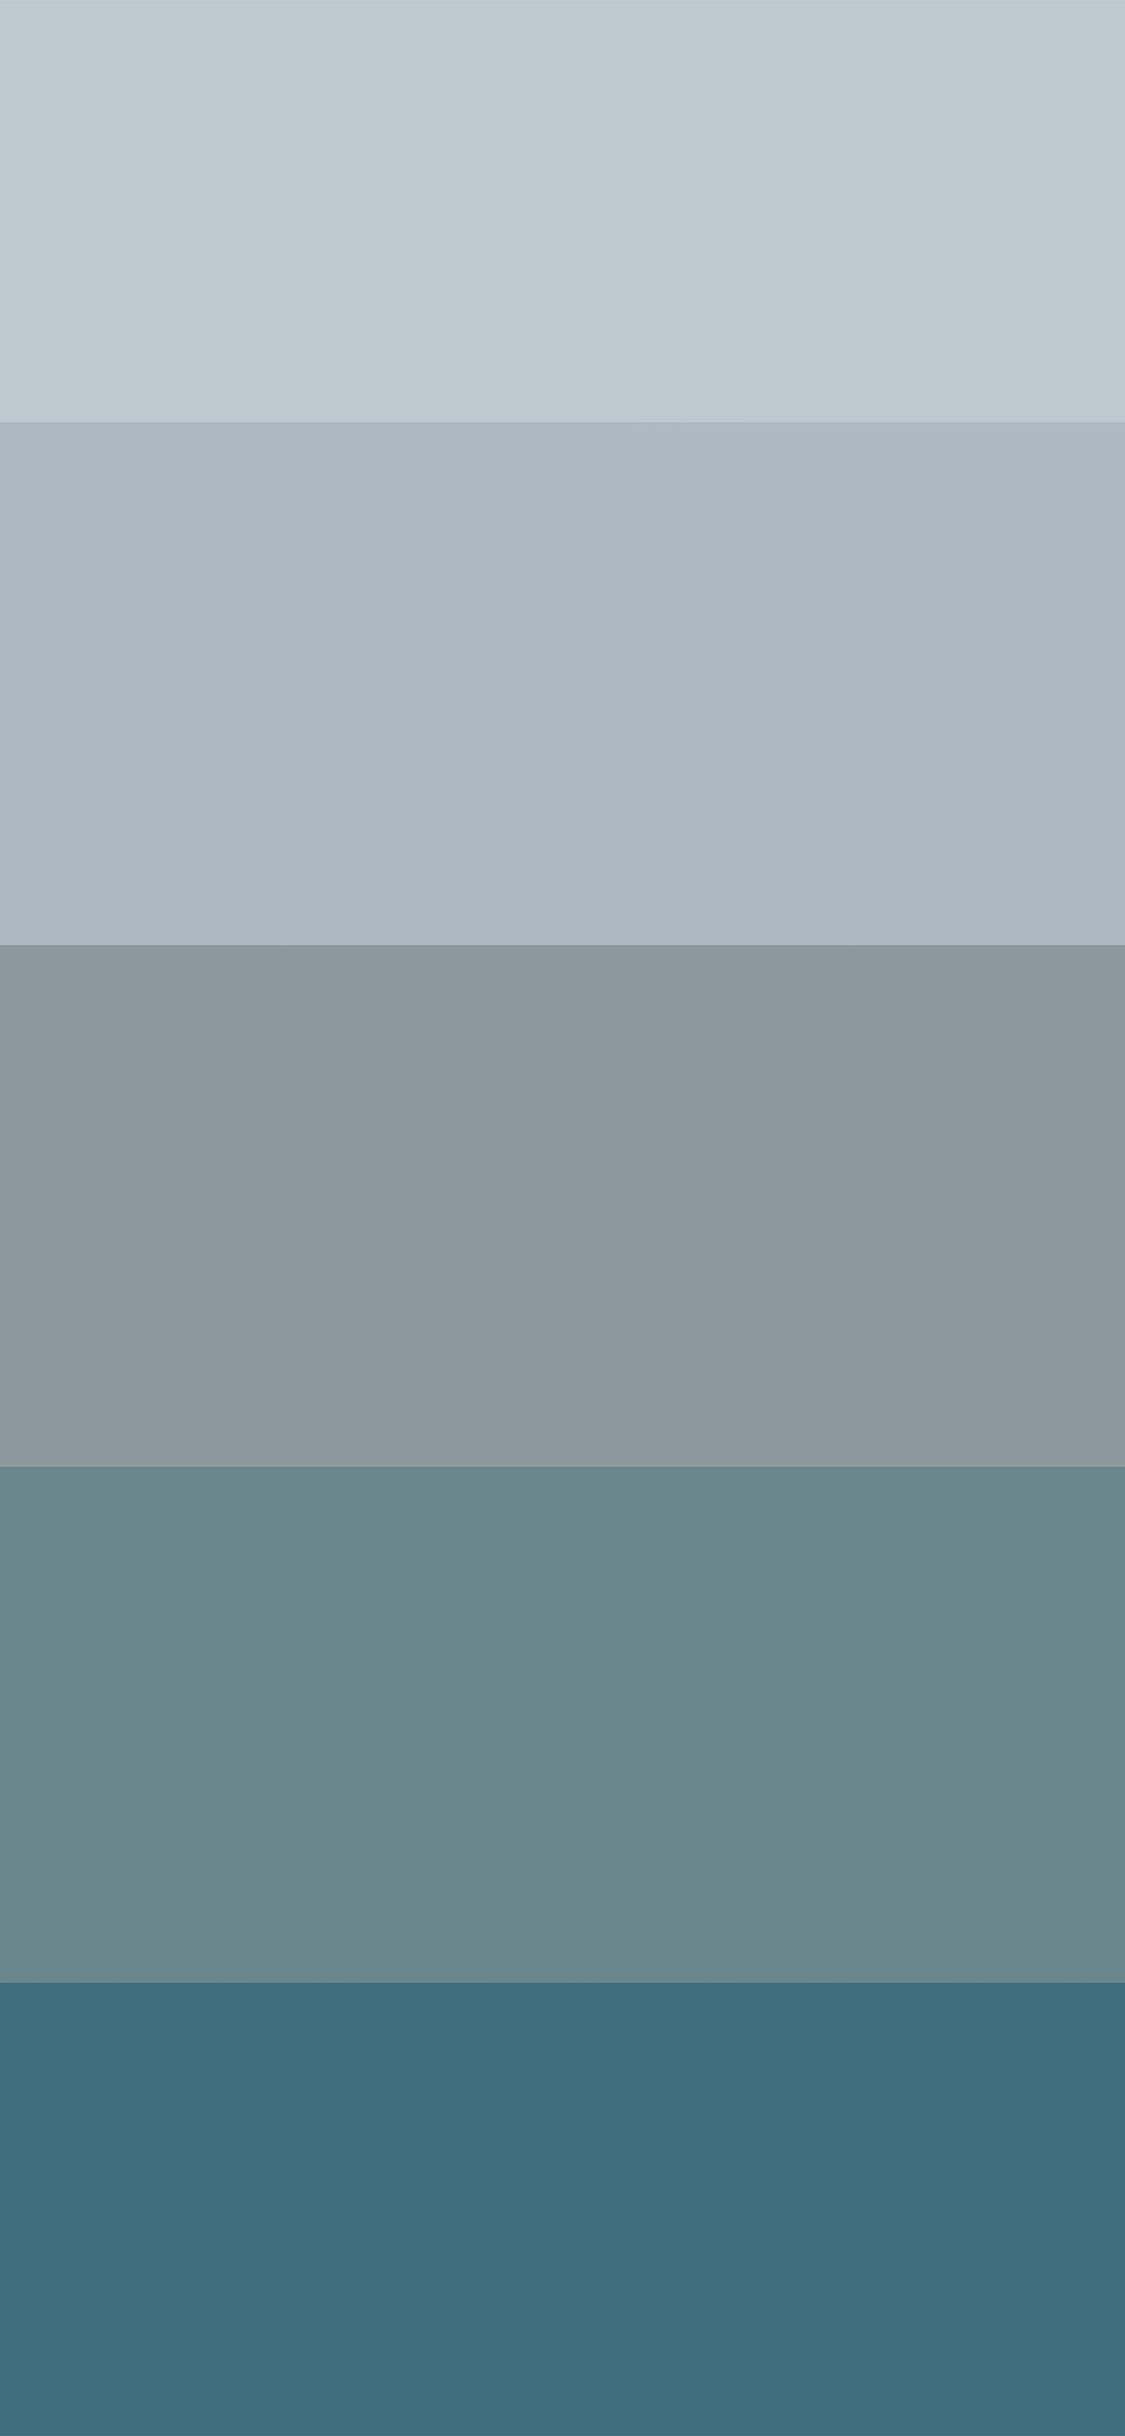 iPhoneXpapers.com-Apple-iPhone-wallpaper-vj47-colorlovers-pattern-blue-simple